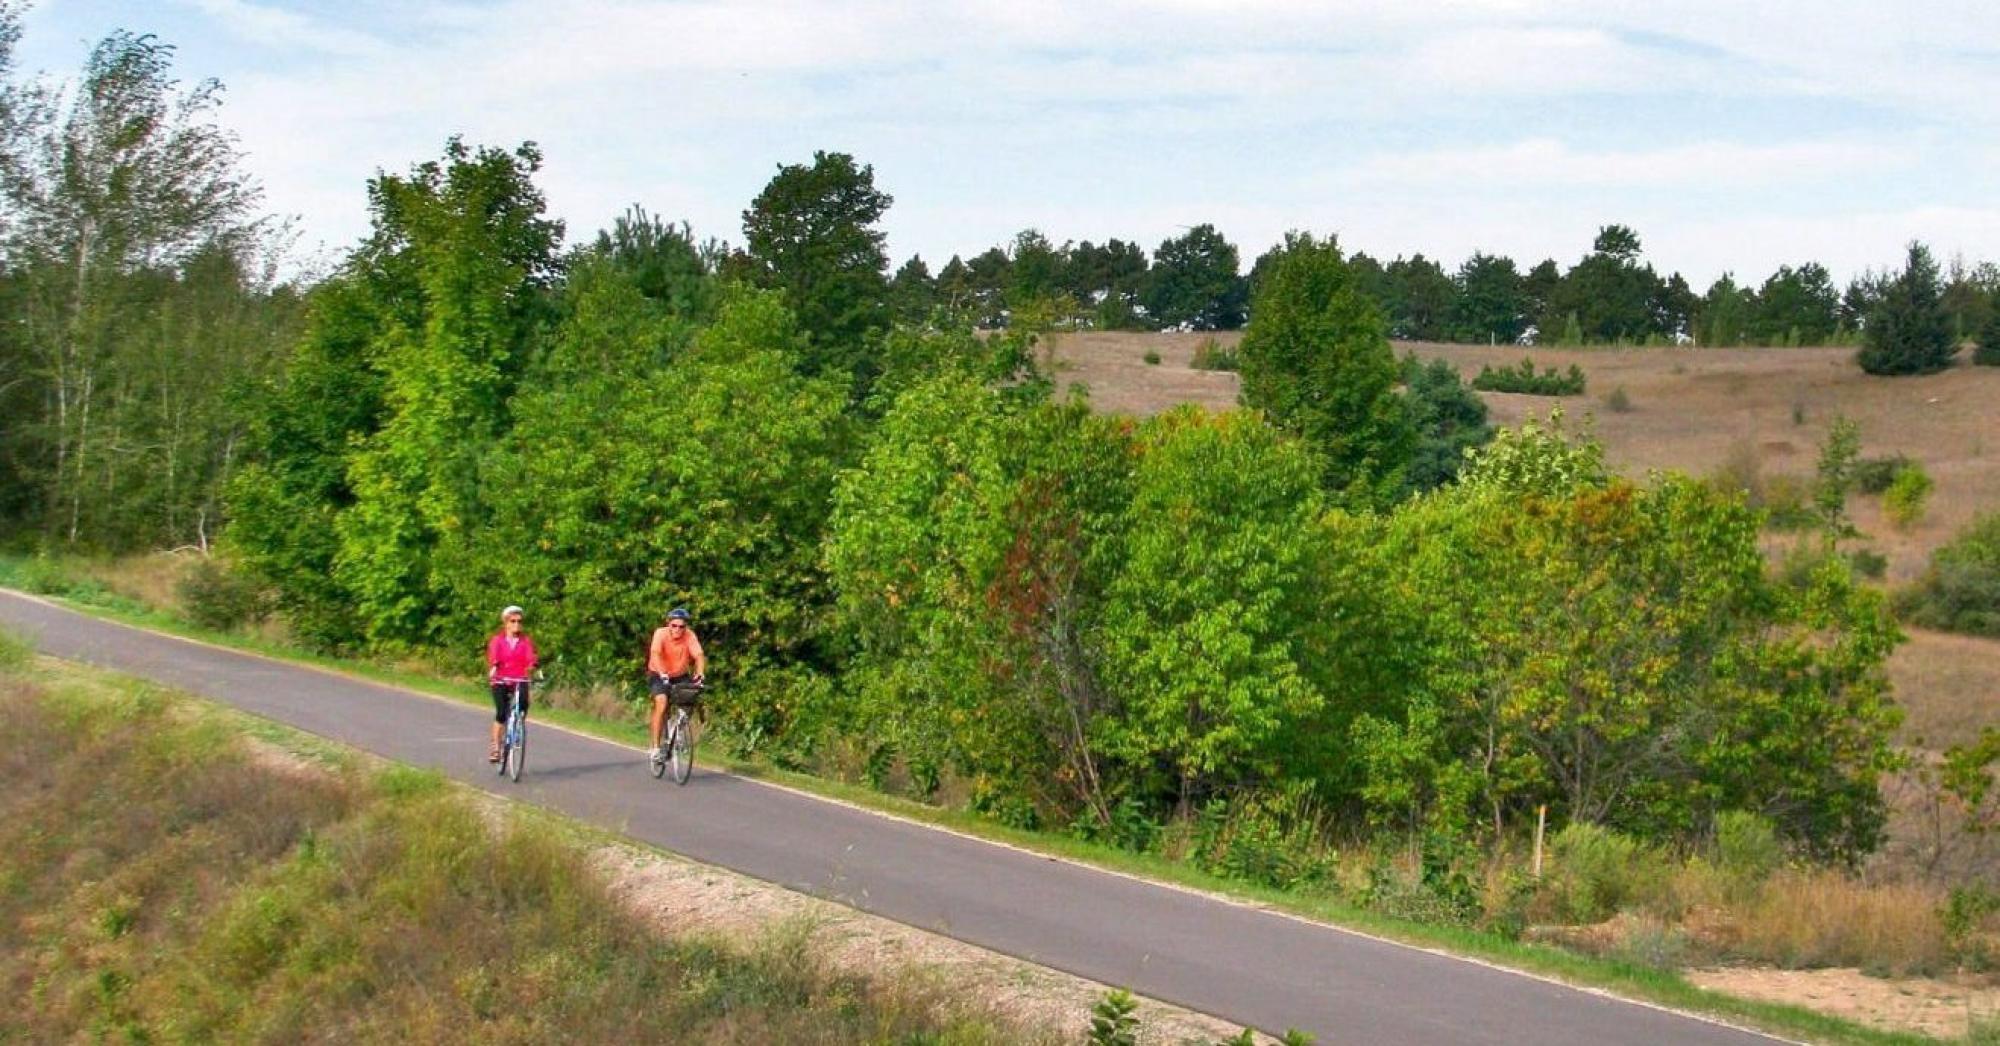 Cambridge bike trail2 2021 01 19 182350